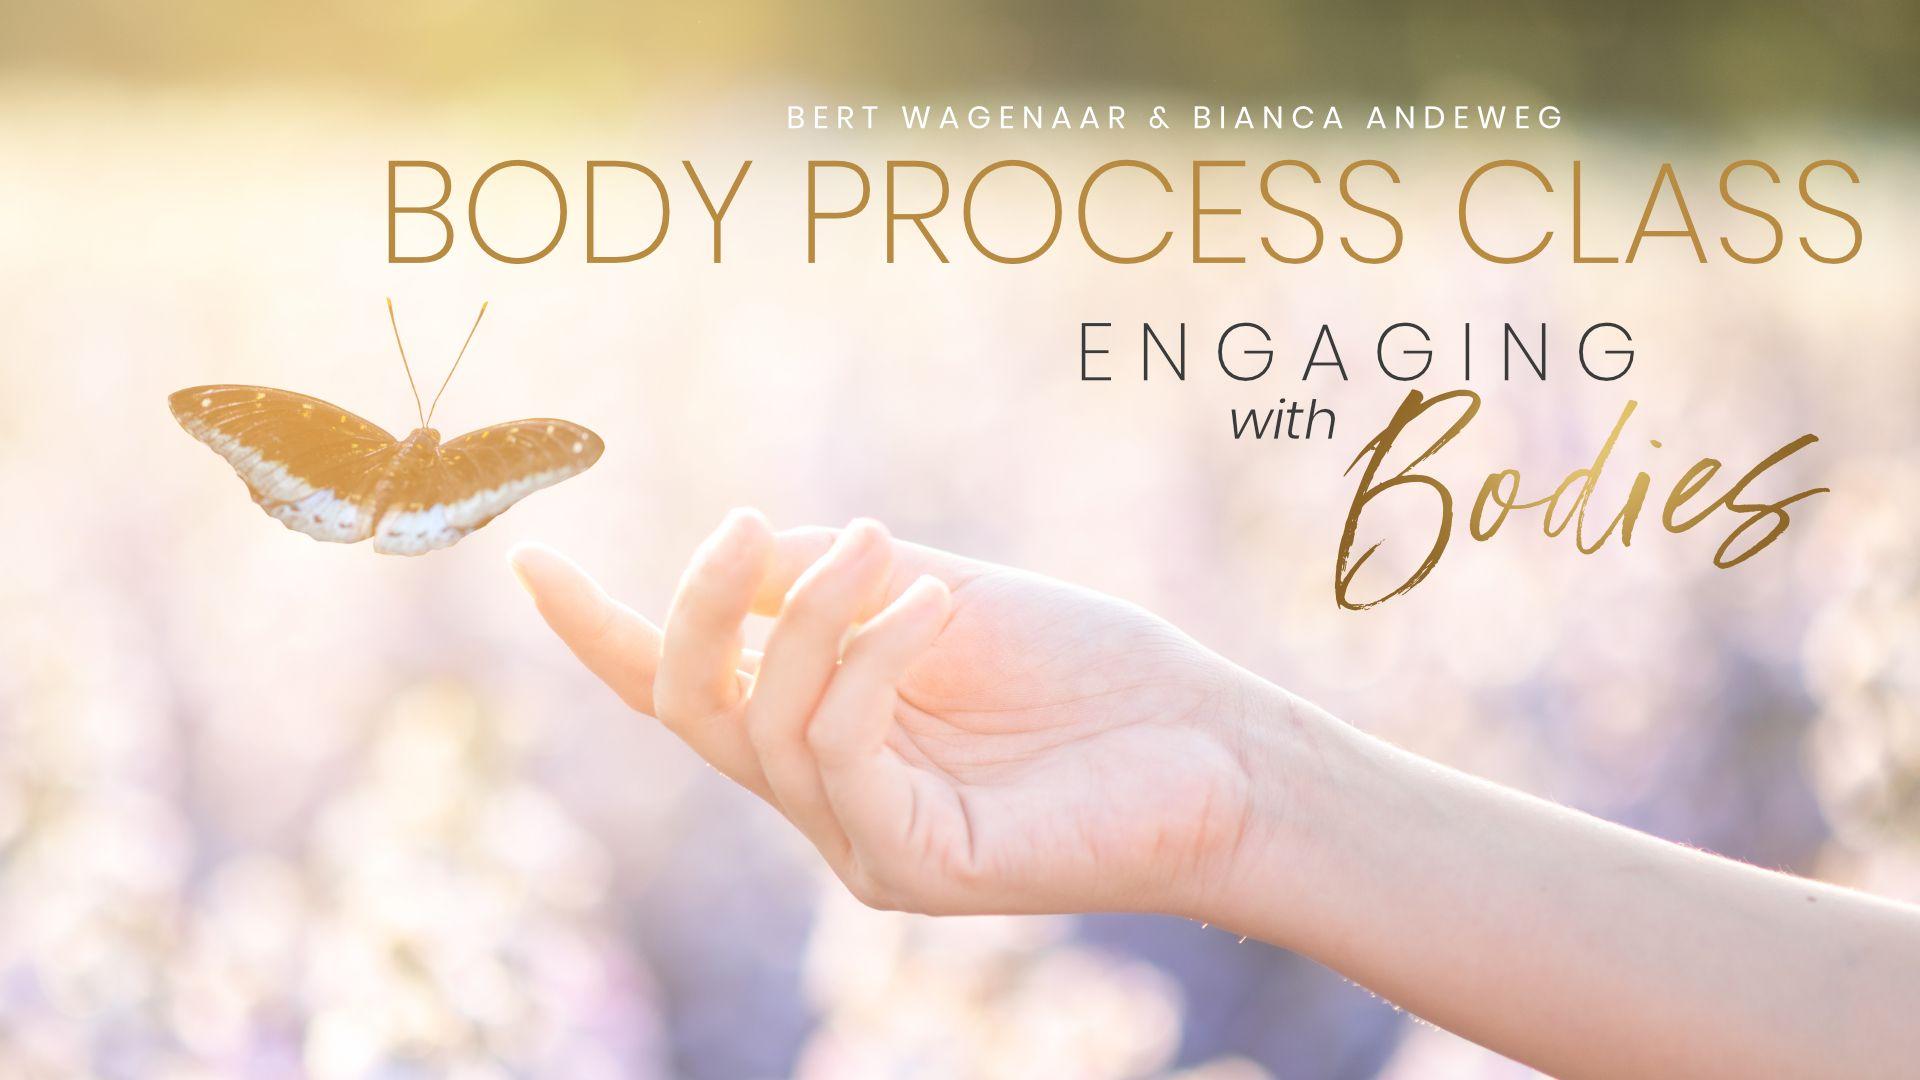 Access Body Process Class